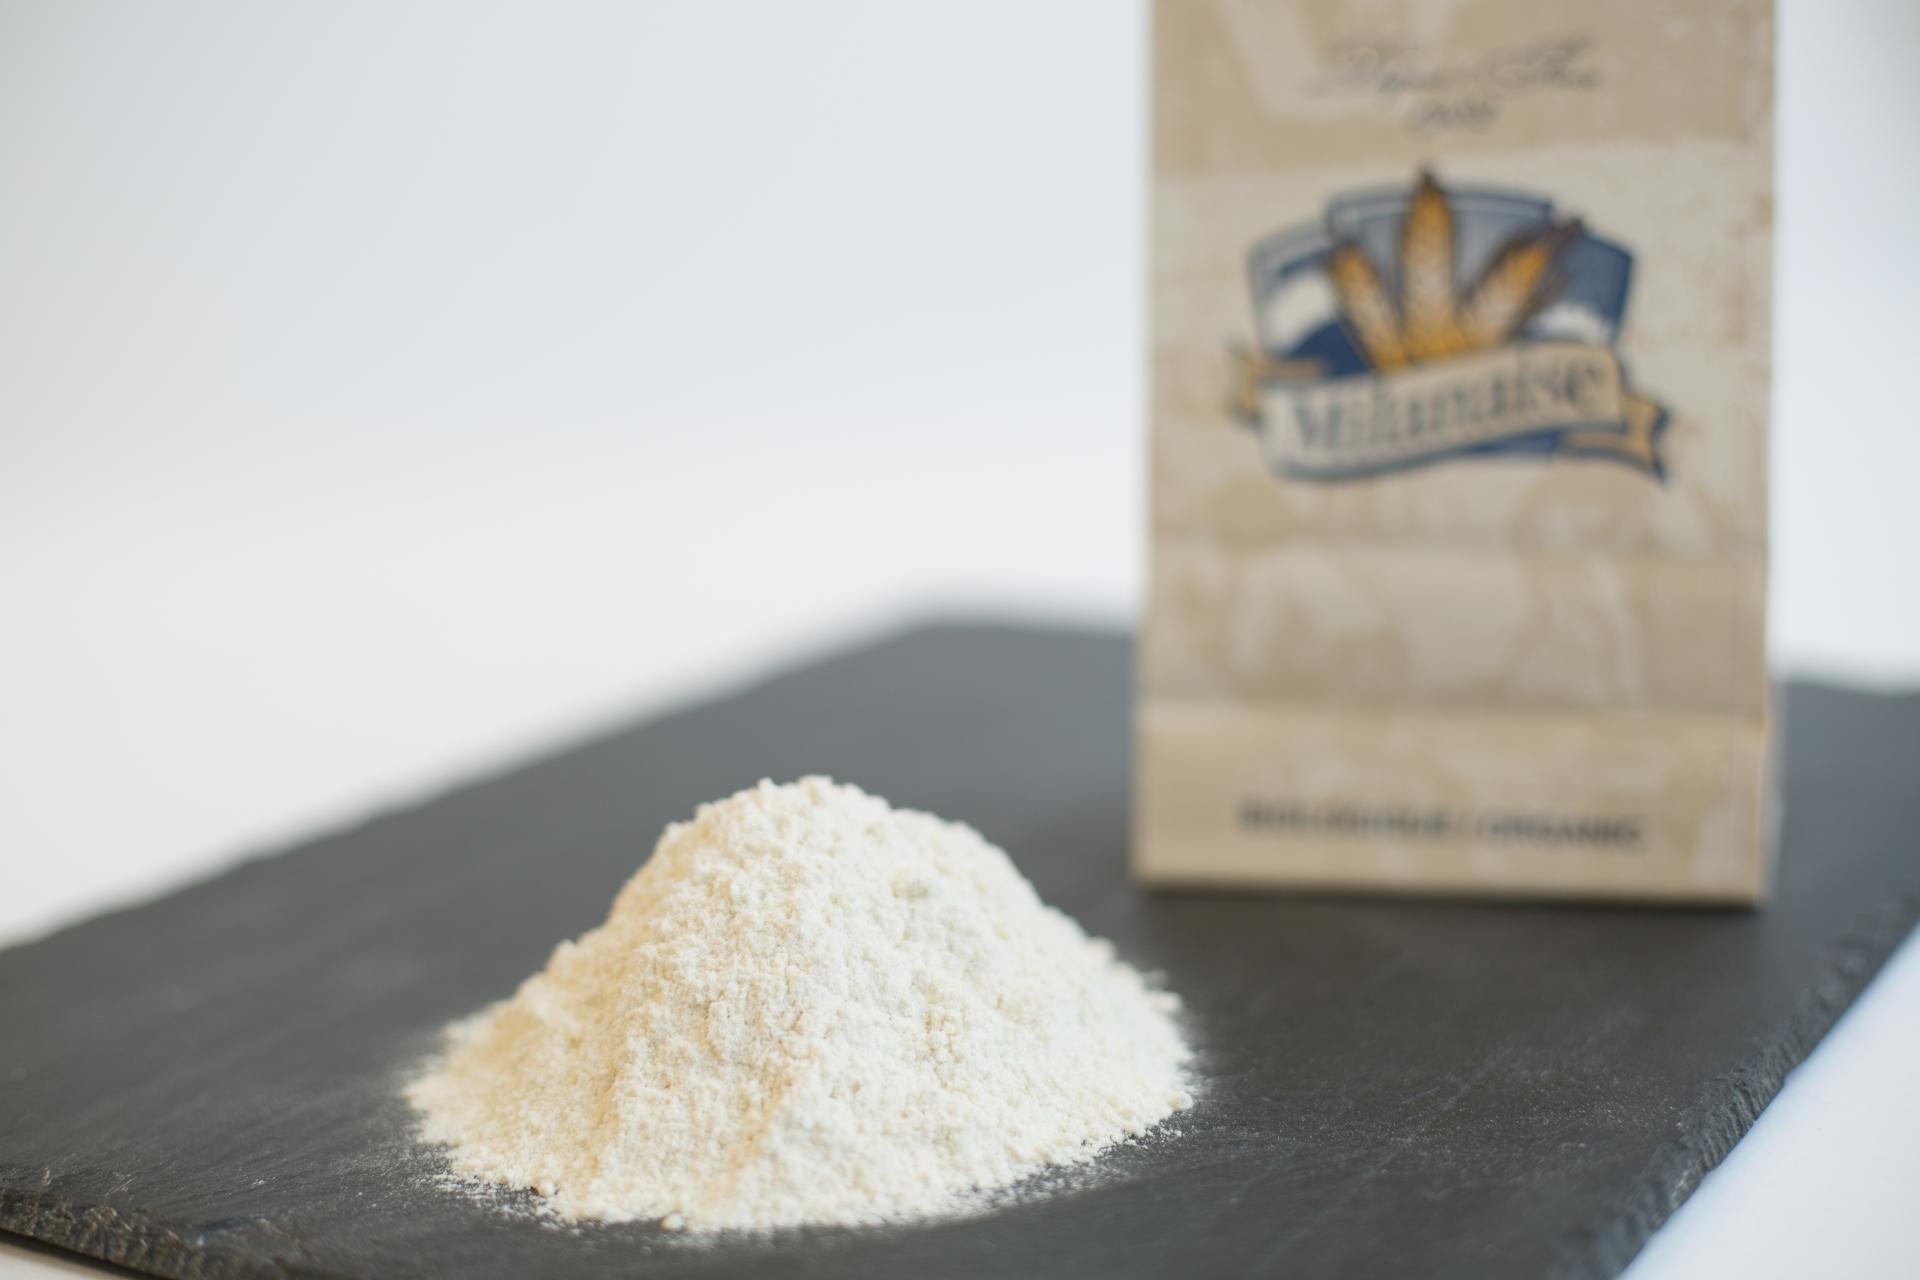 Organic Unbleached White Winter Wheat Flour